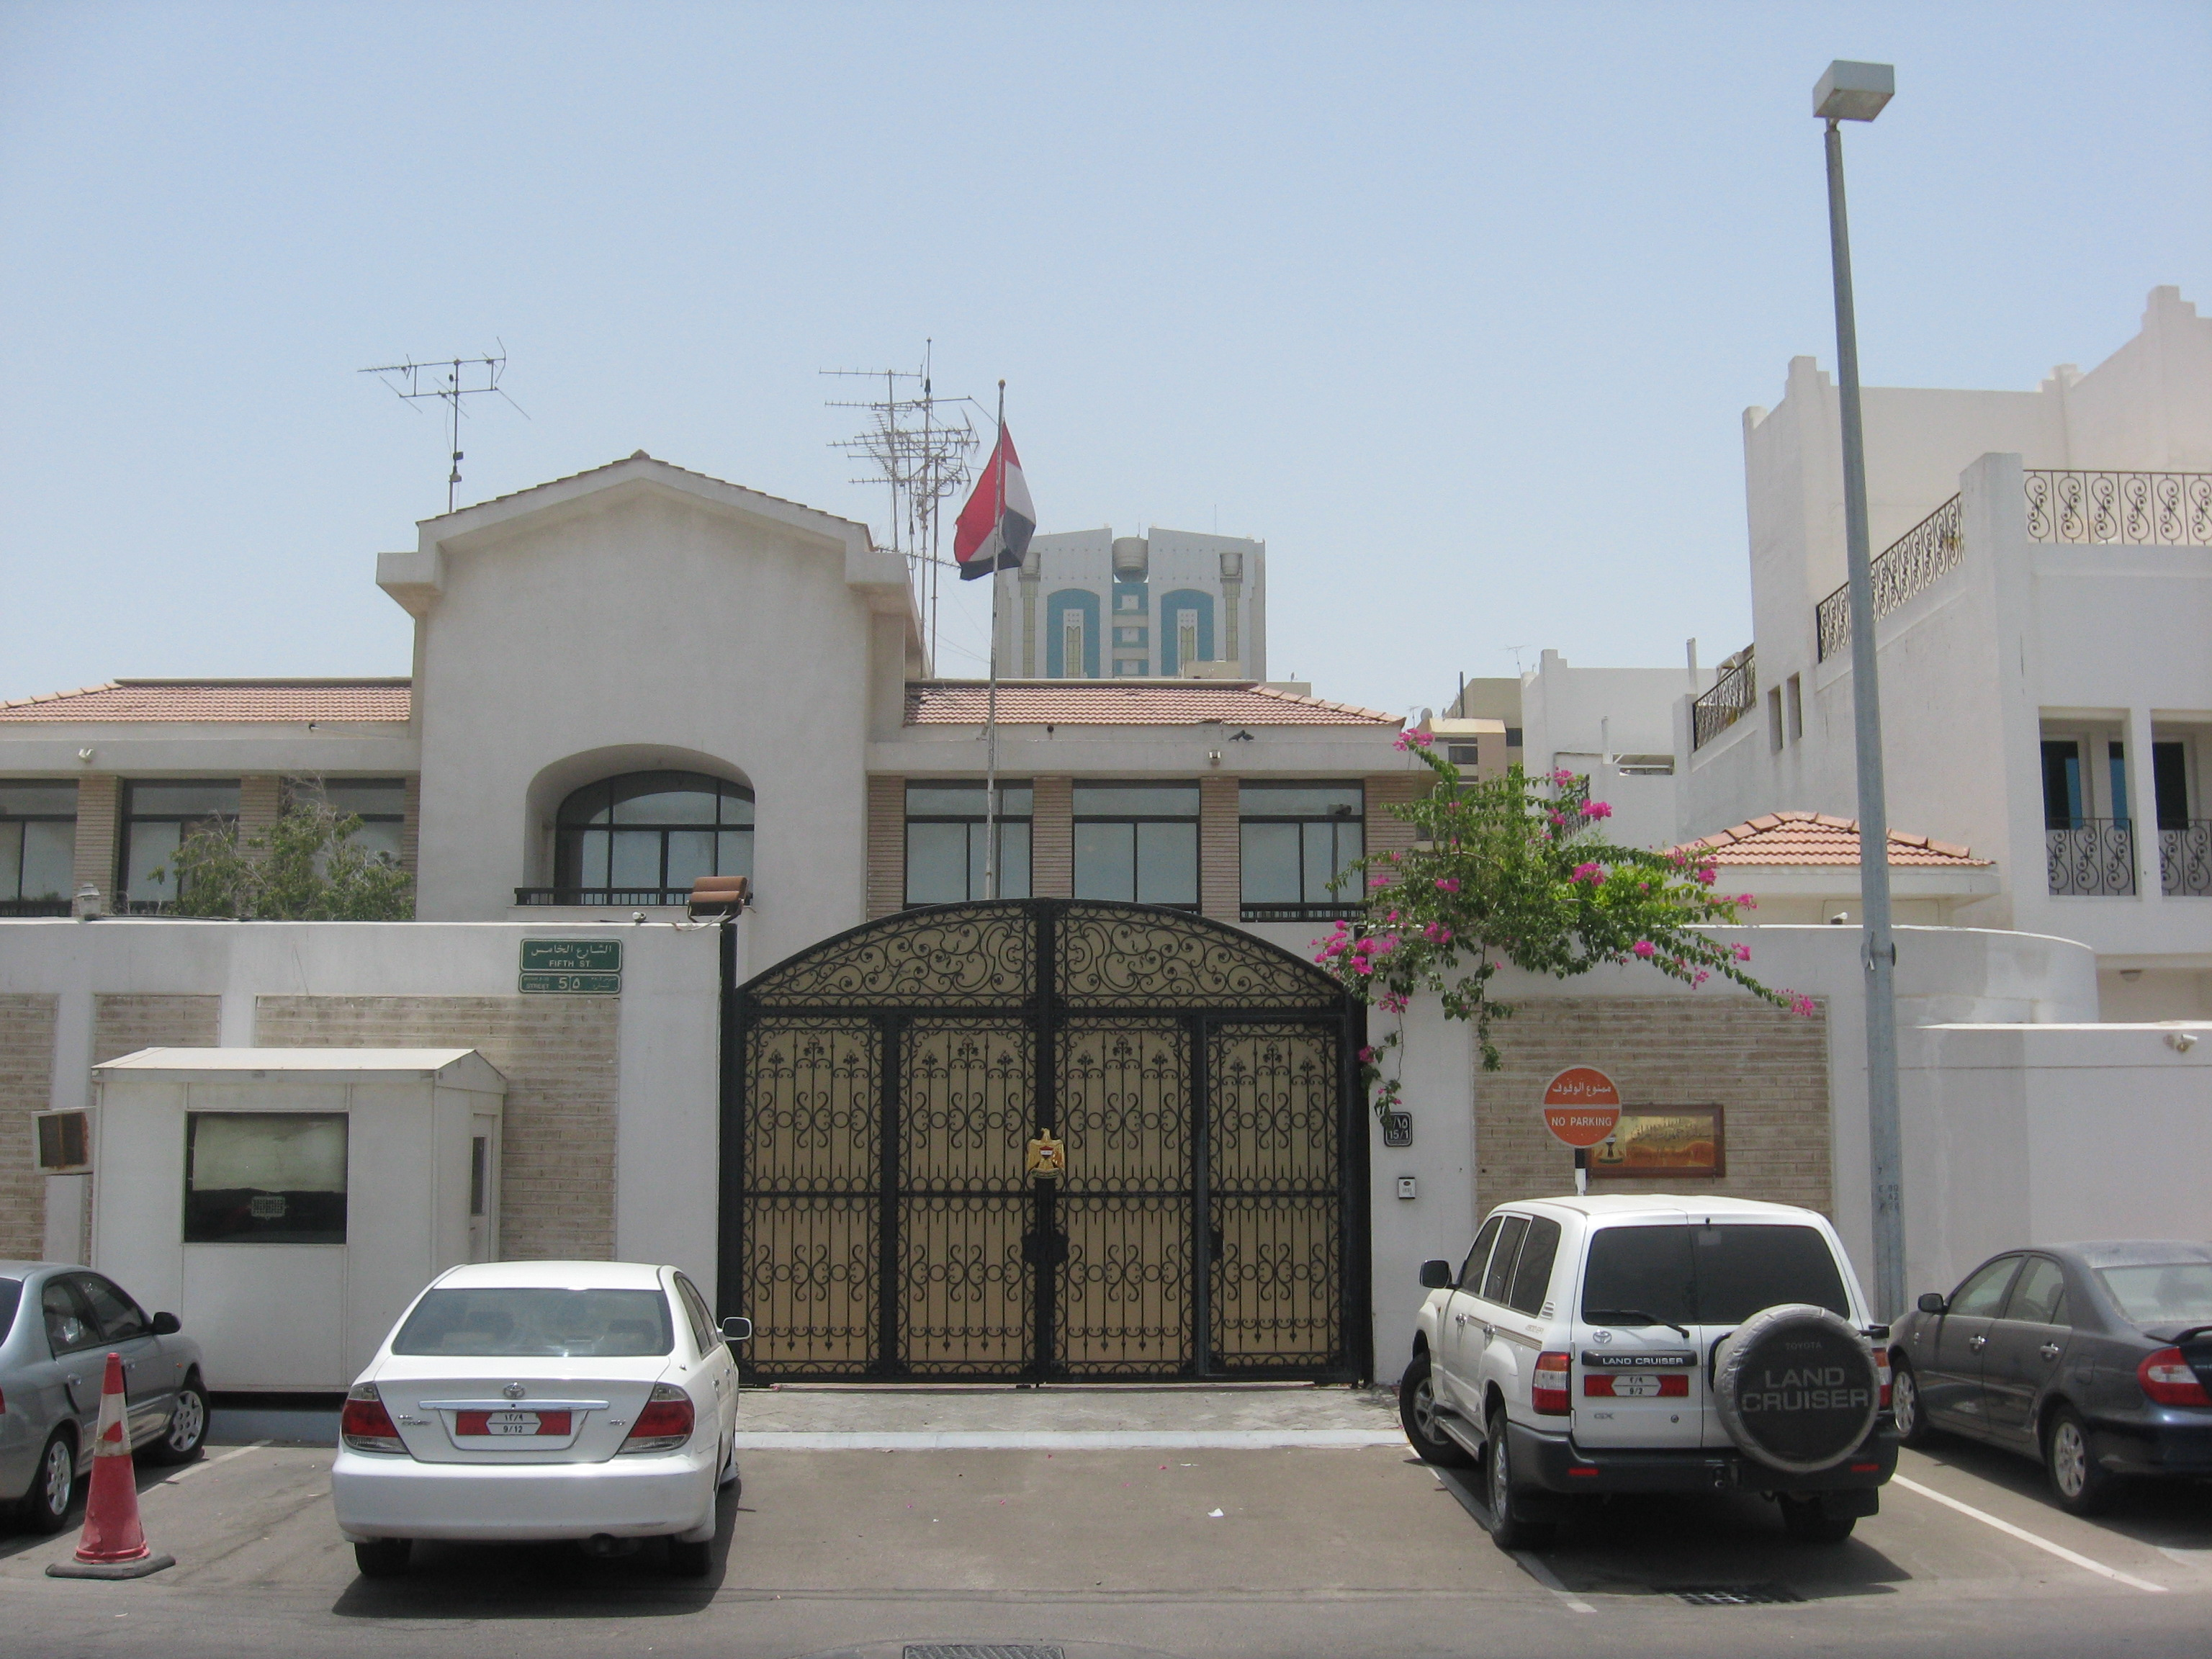 Embassy Of Russia Abu Dhabi Edisnormanmediacom - Road map us embassy abu dhabi